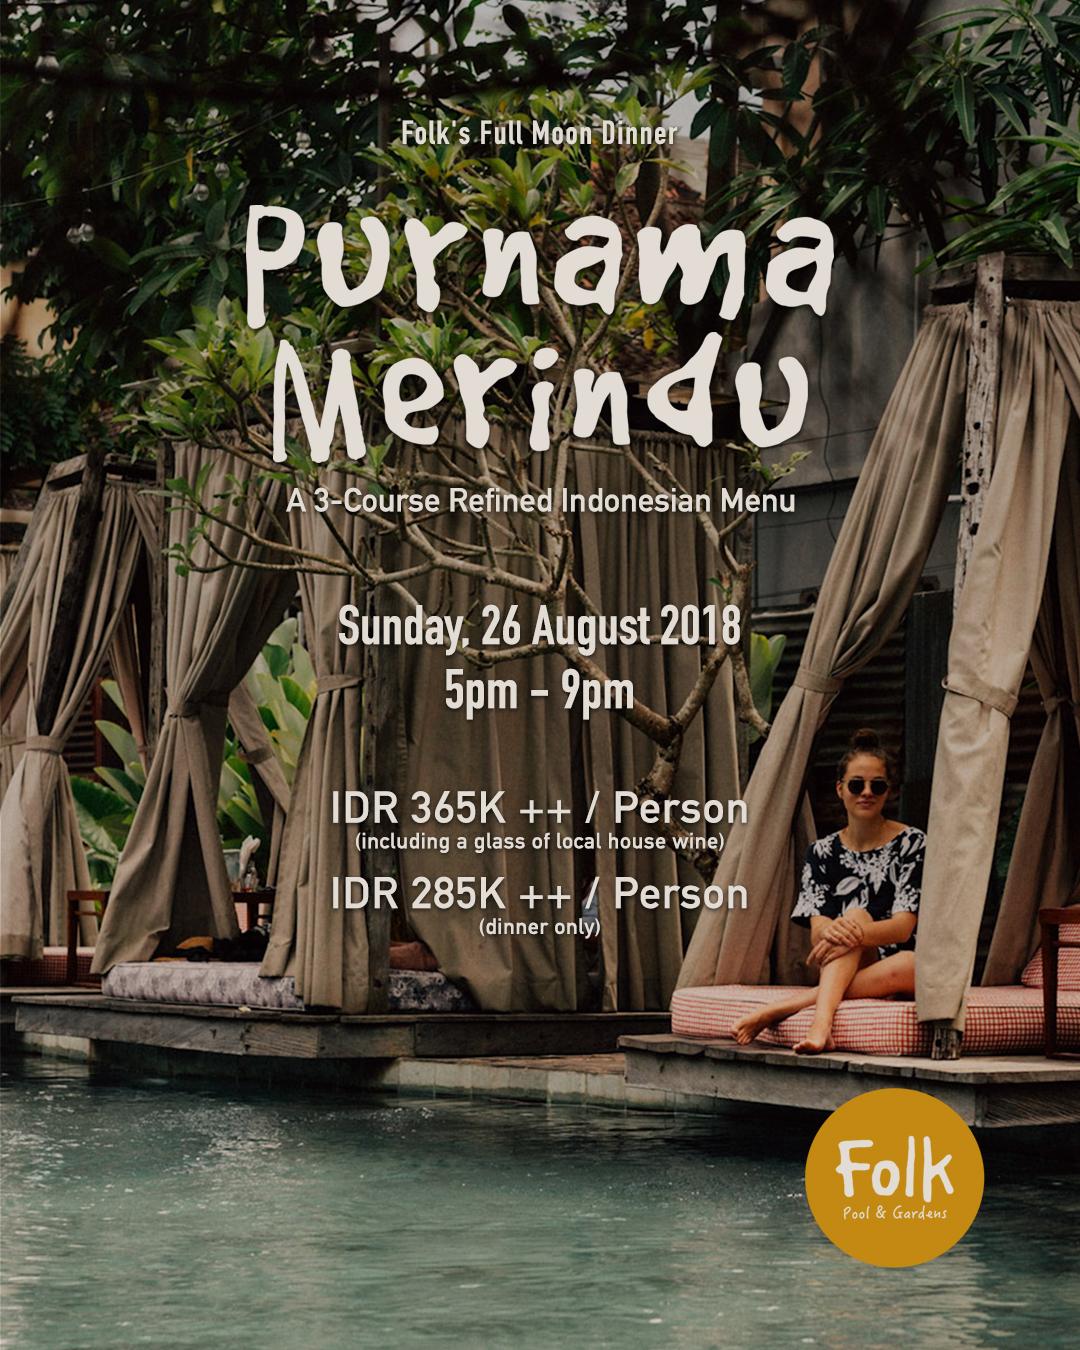 FPG-PURNAMA-AUGUST2018-IG-1.jpg